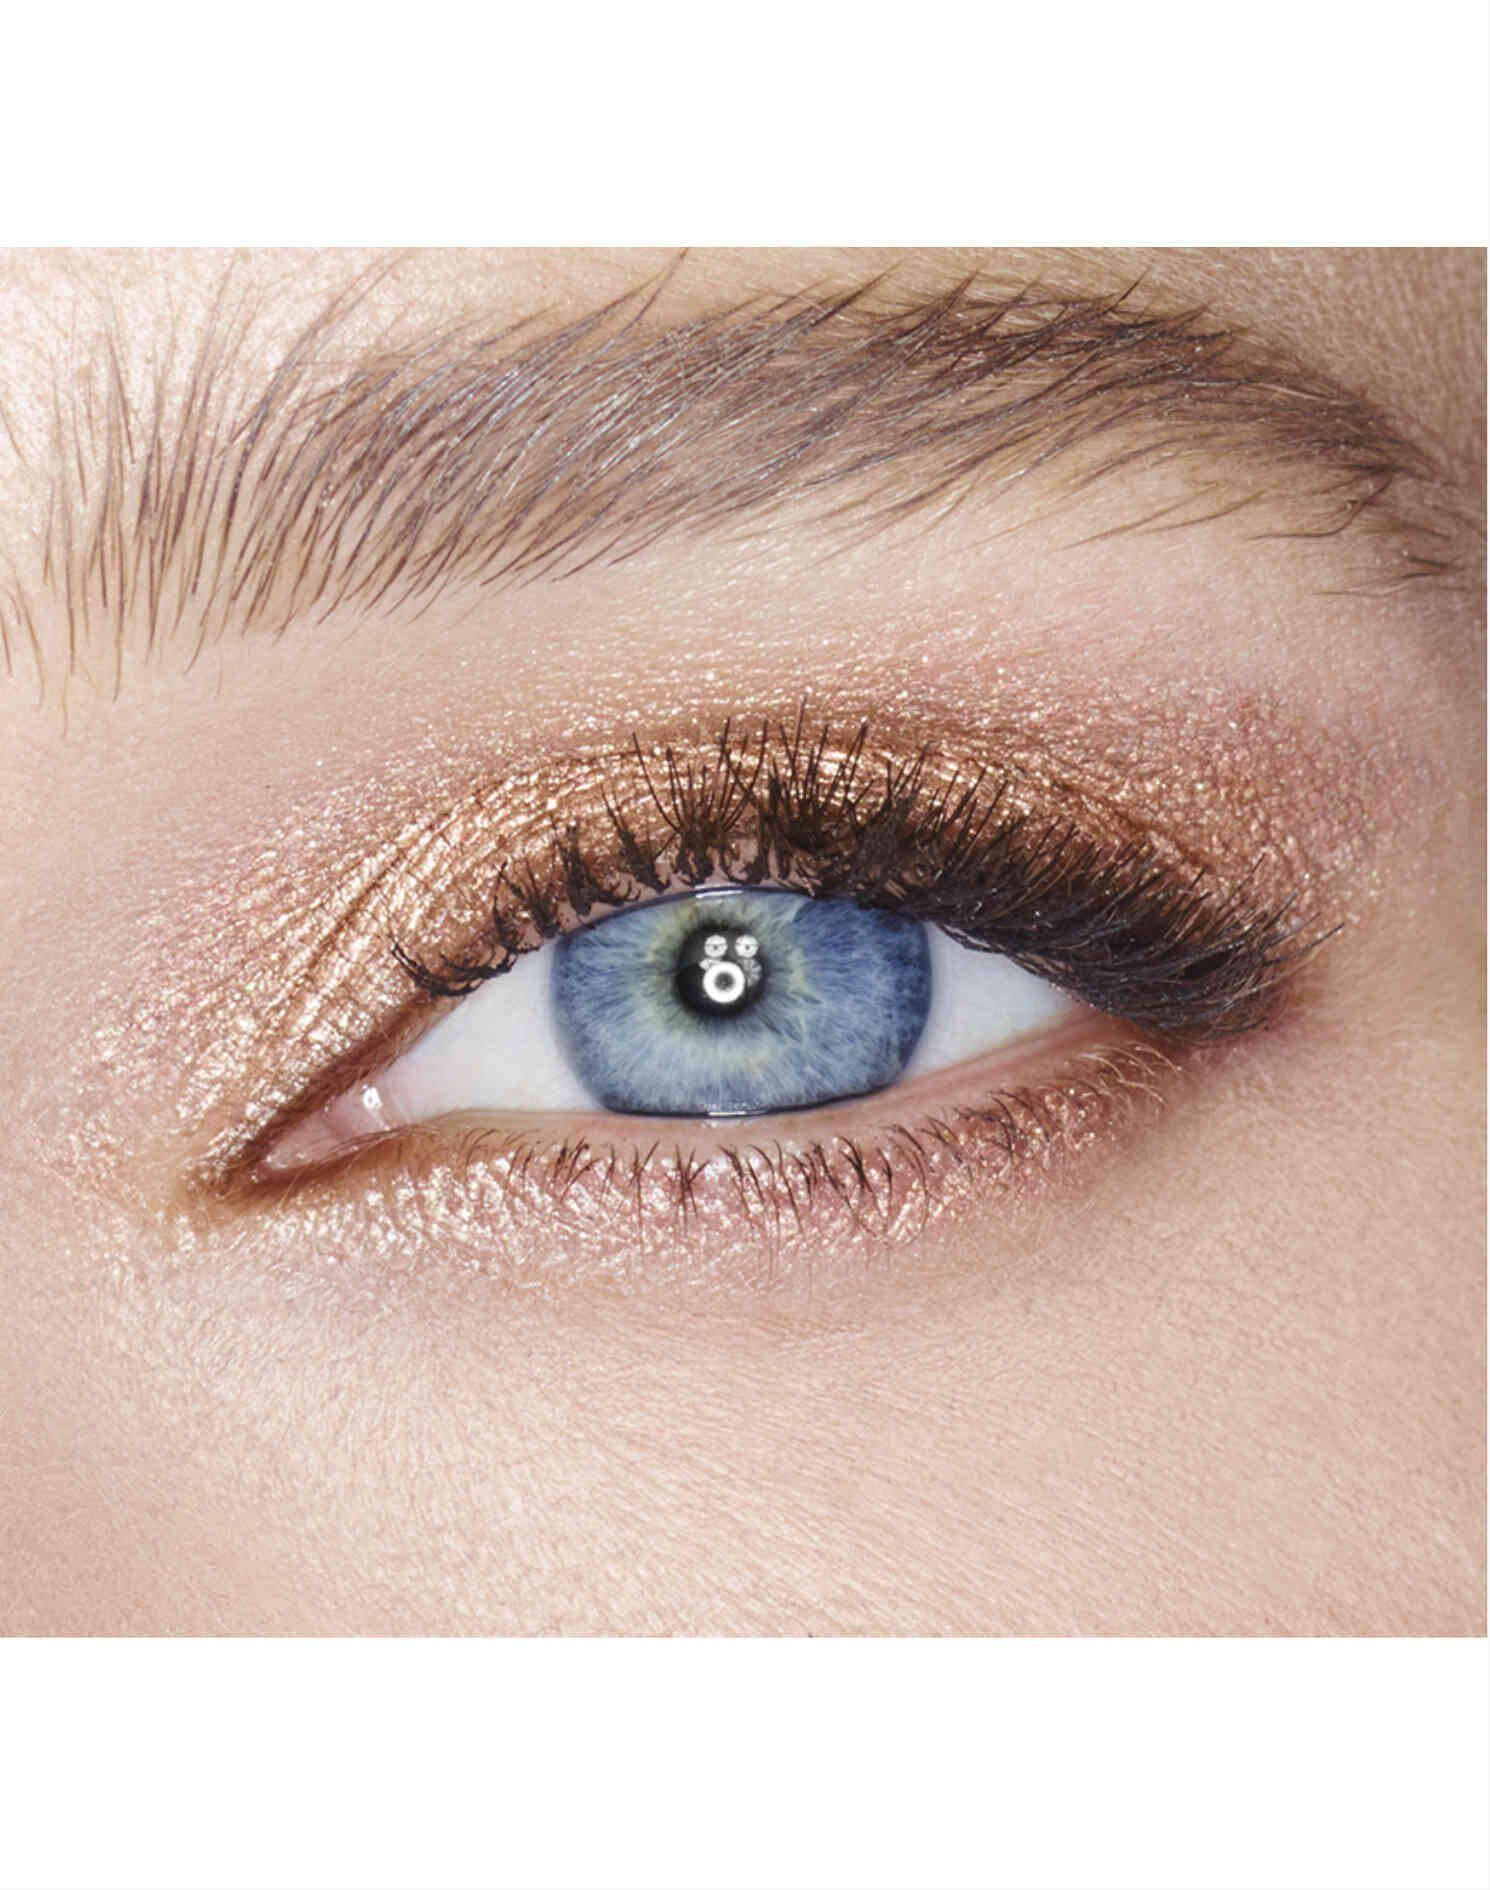 light shimmer eyeshadow pencil designed for blue eyes